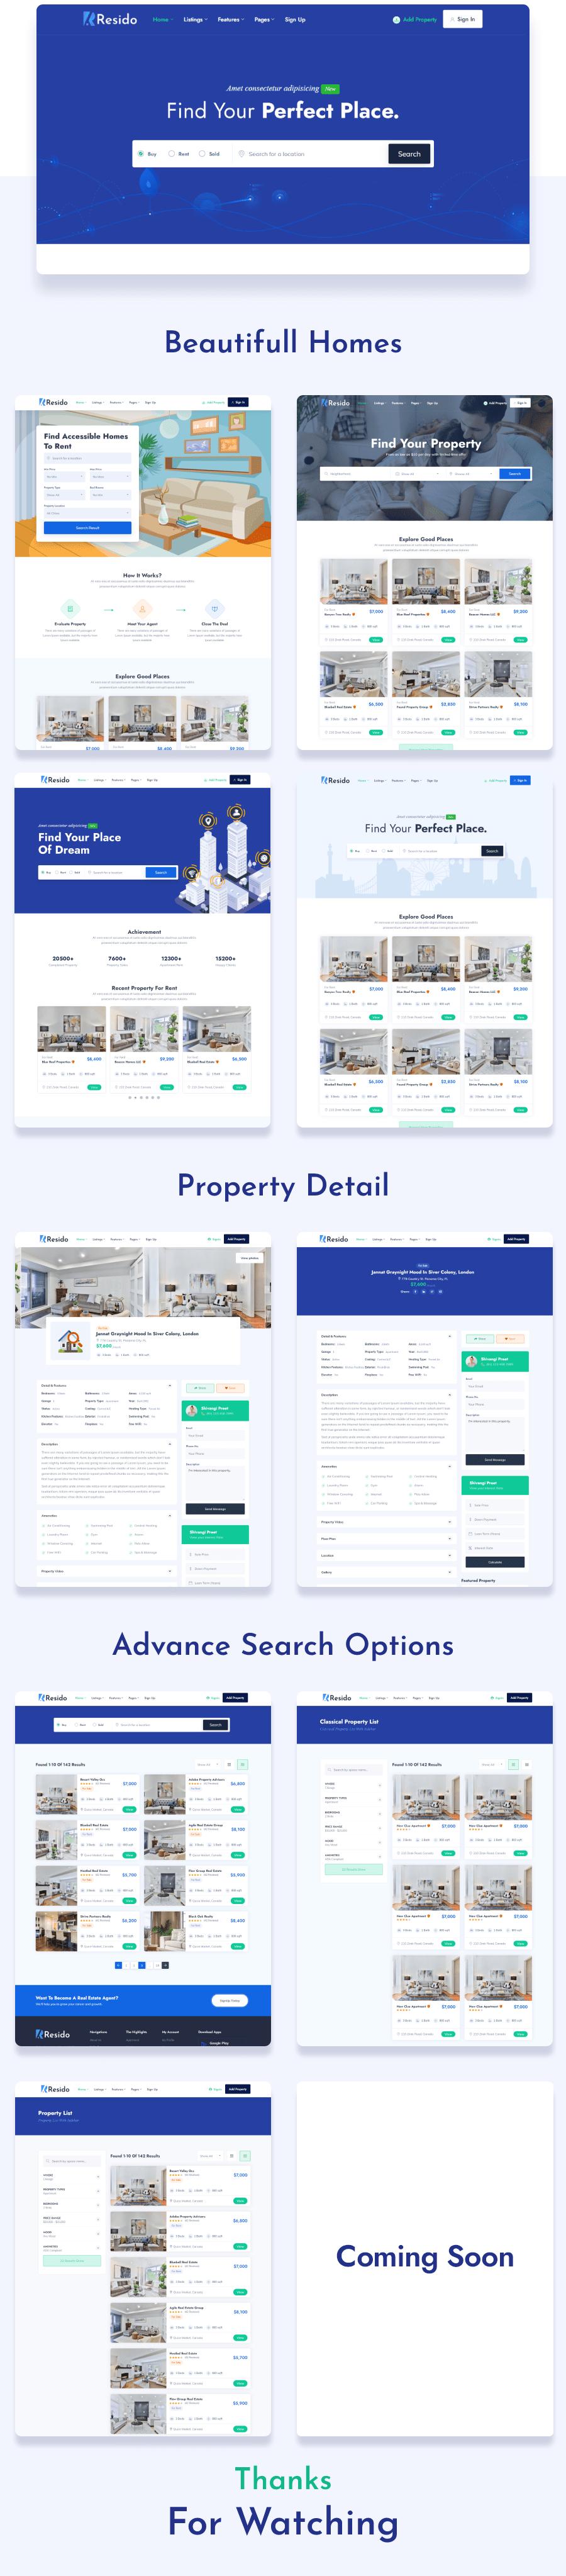 Resido - Real Estate WordPress Theme - 2